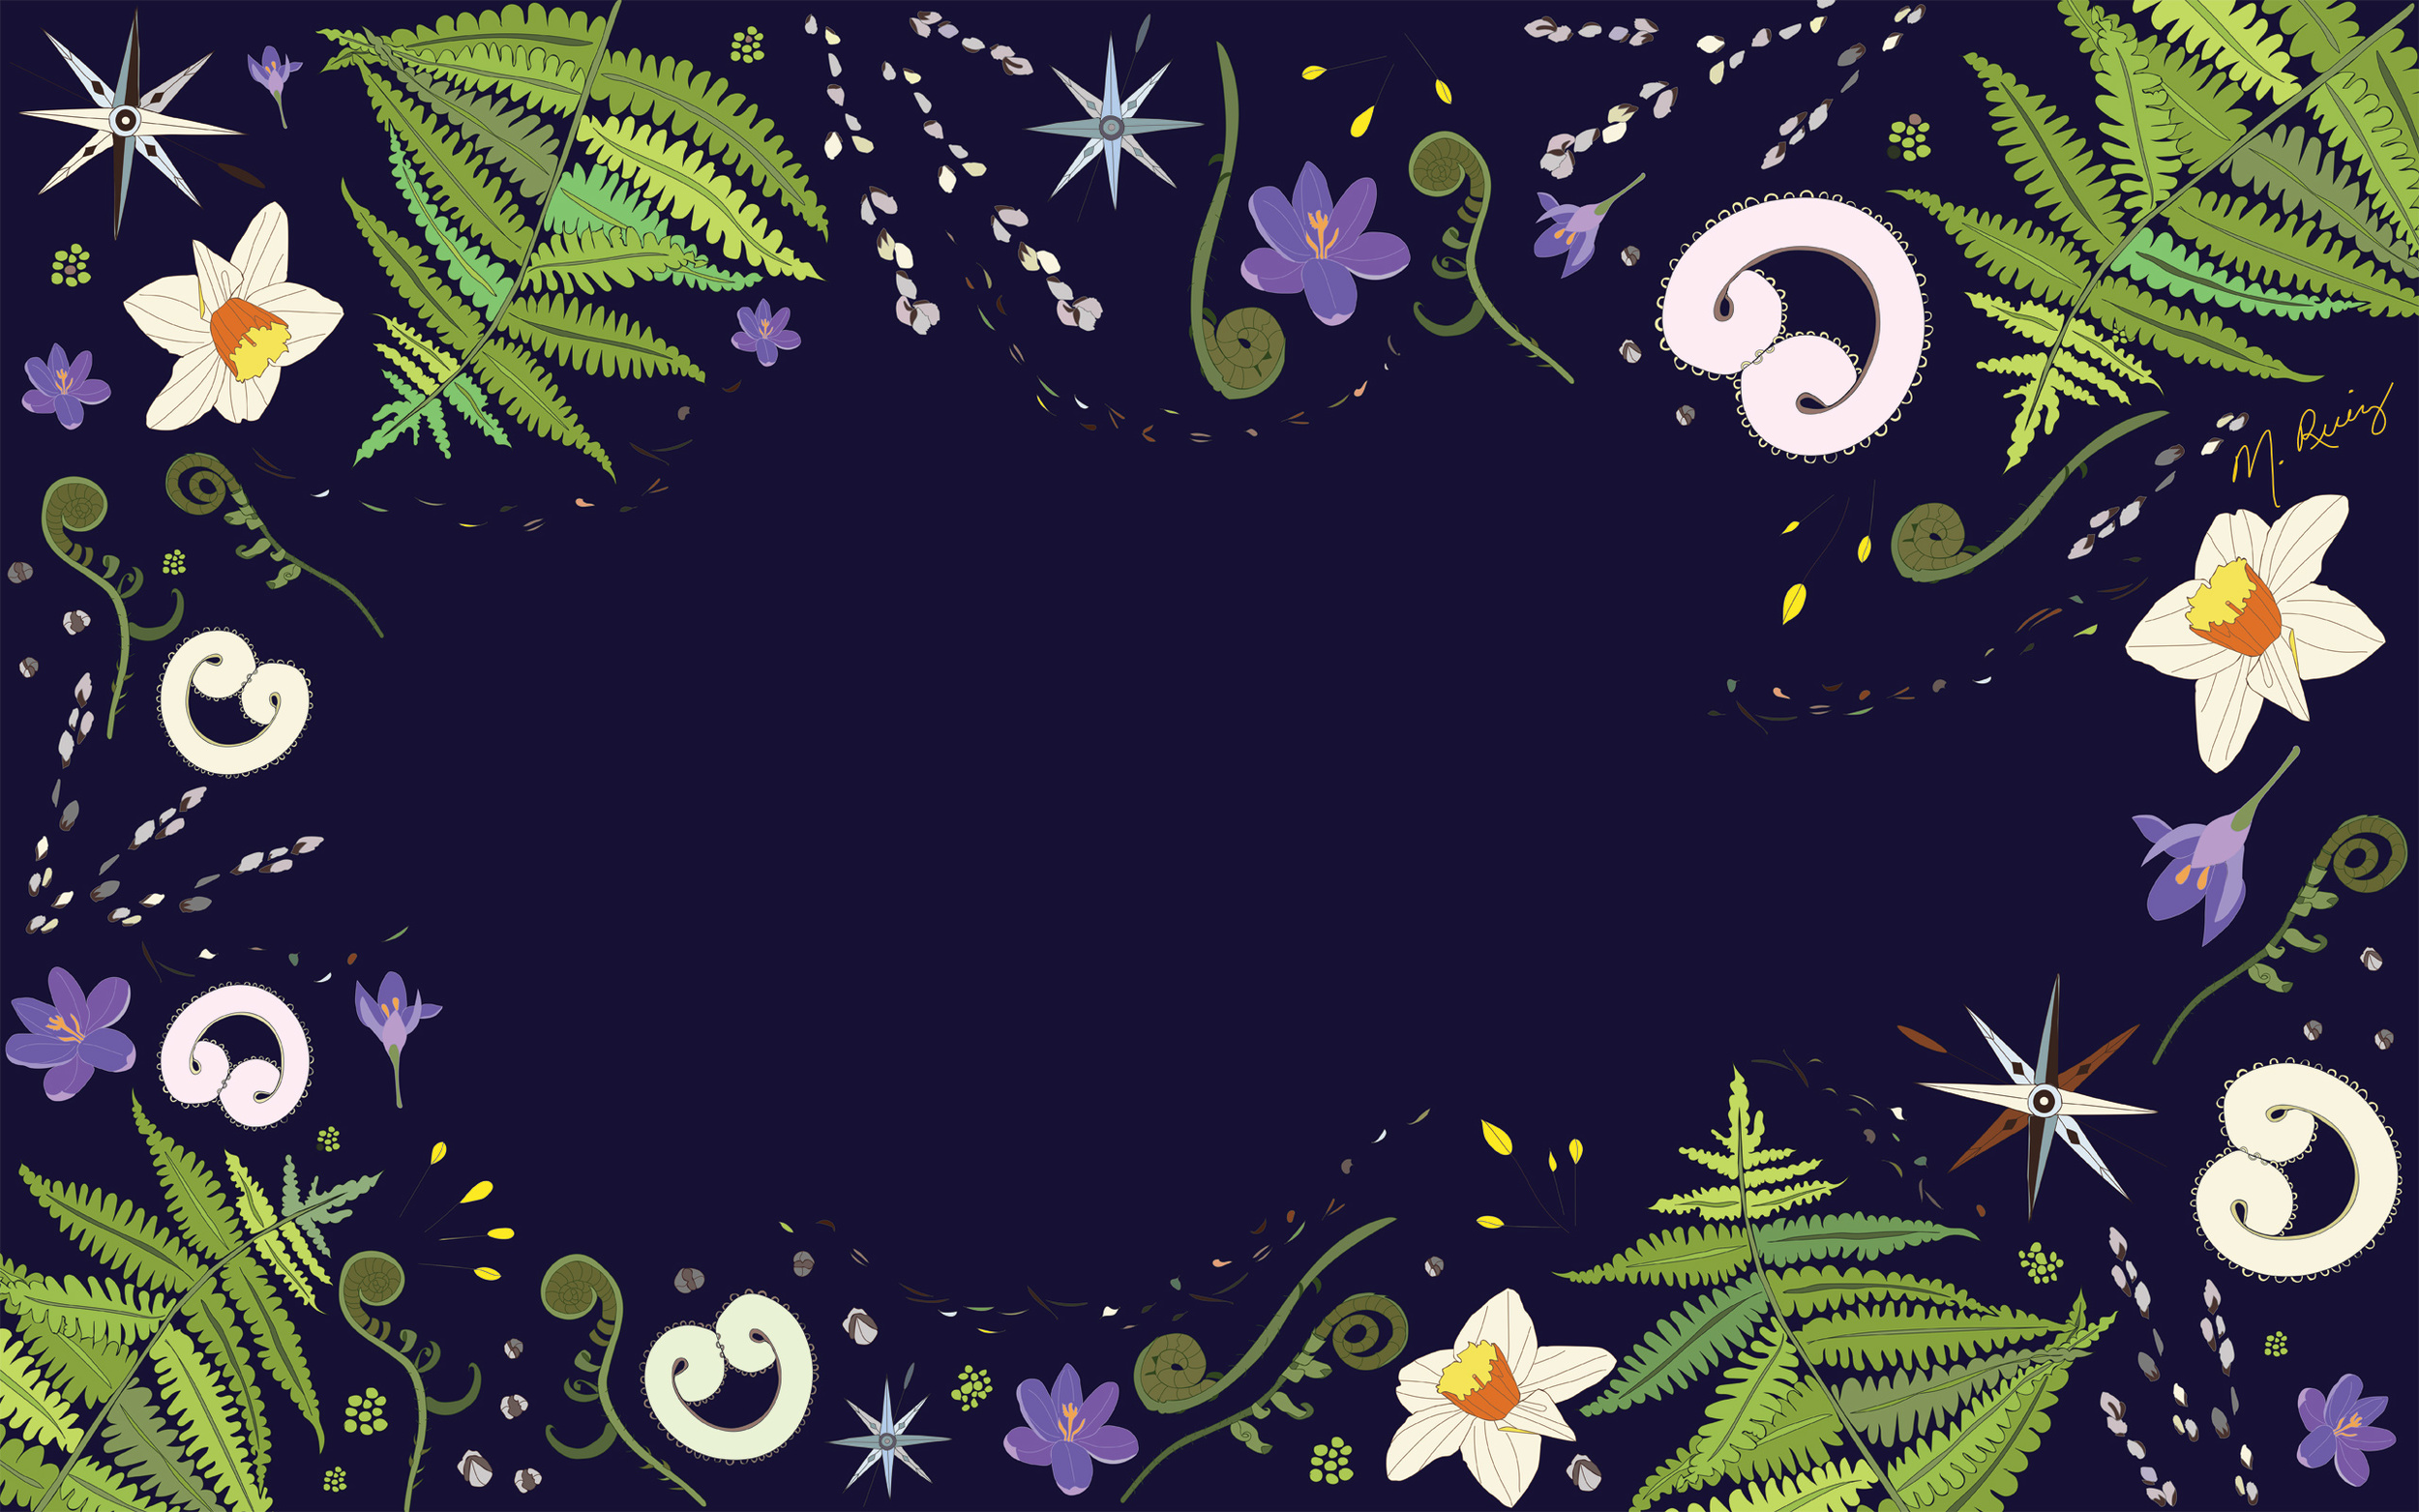 Spring Wind desktop wallpaper - Dark